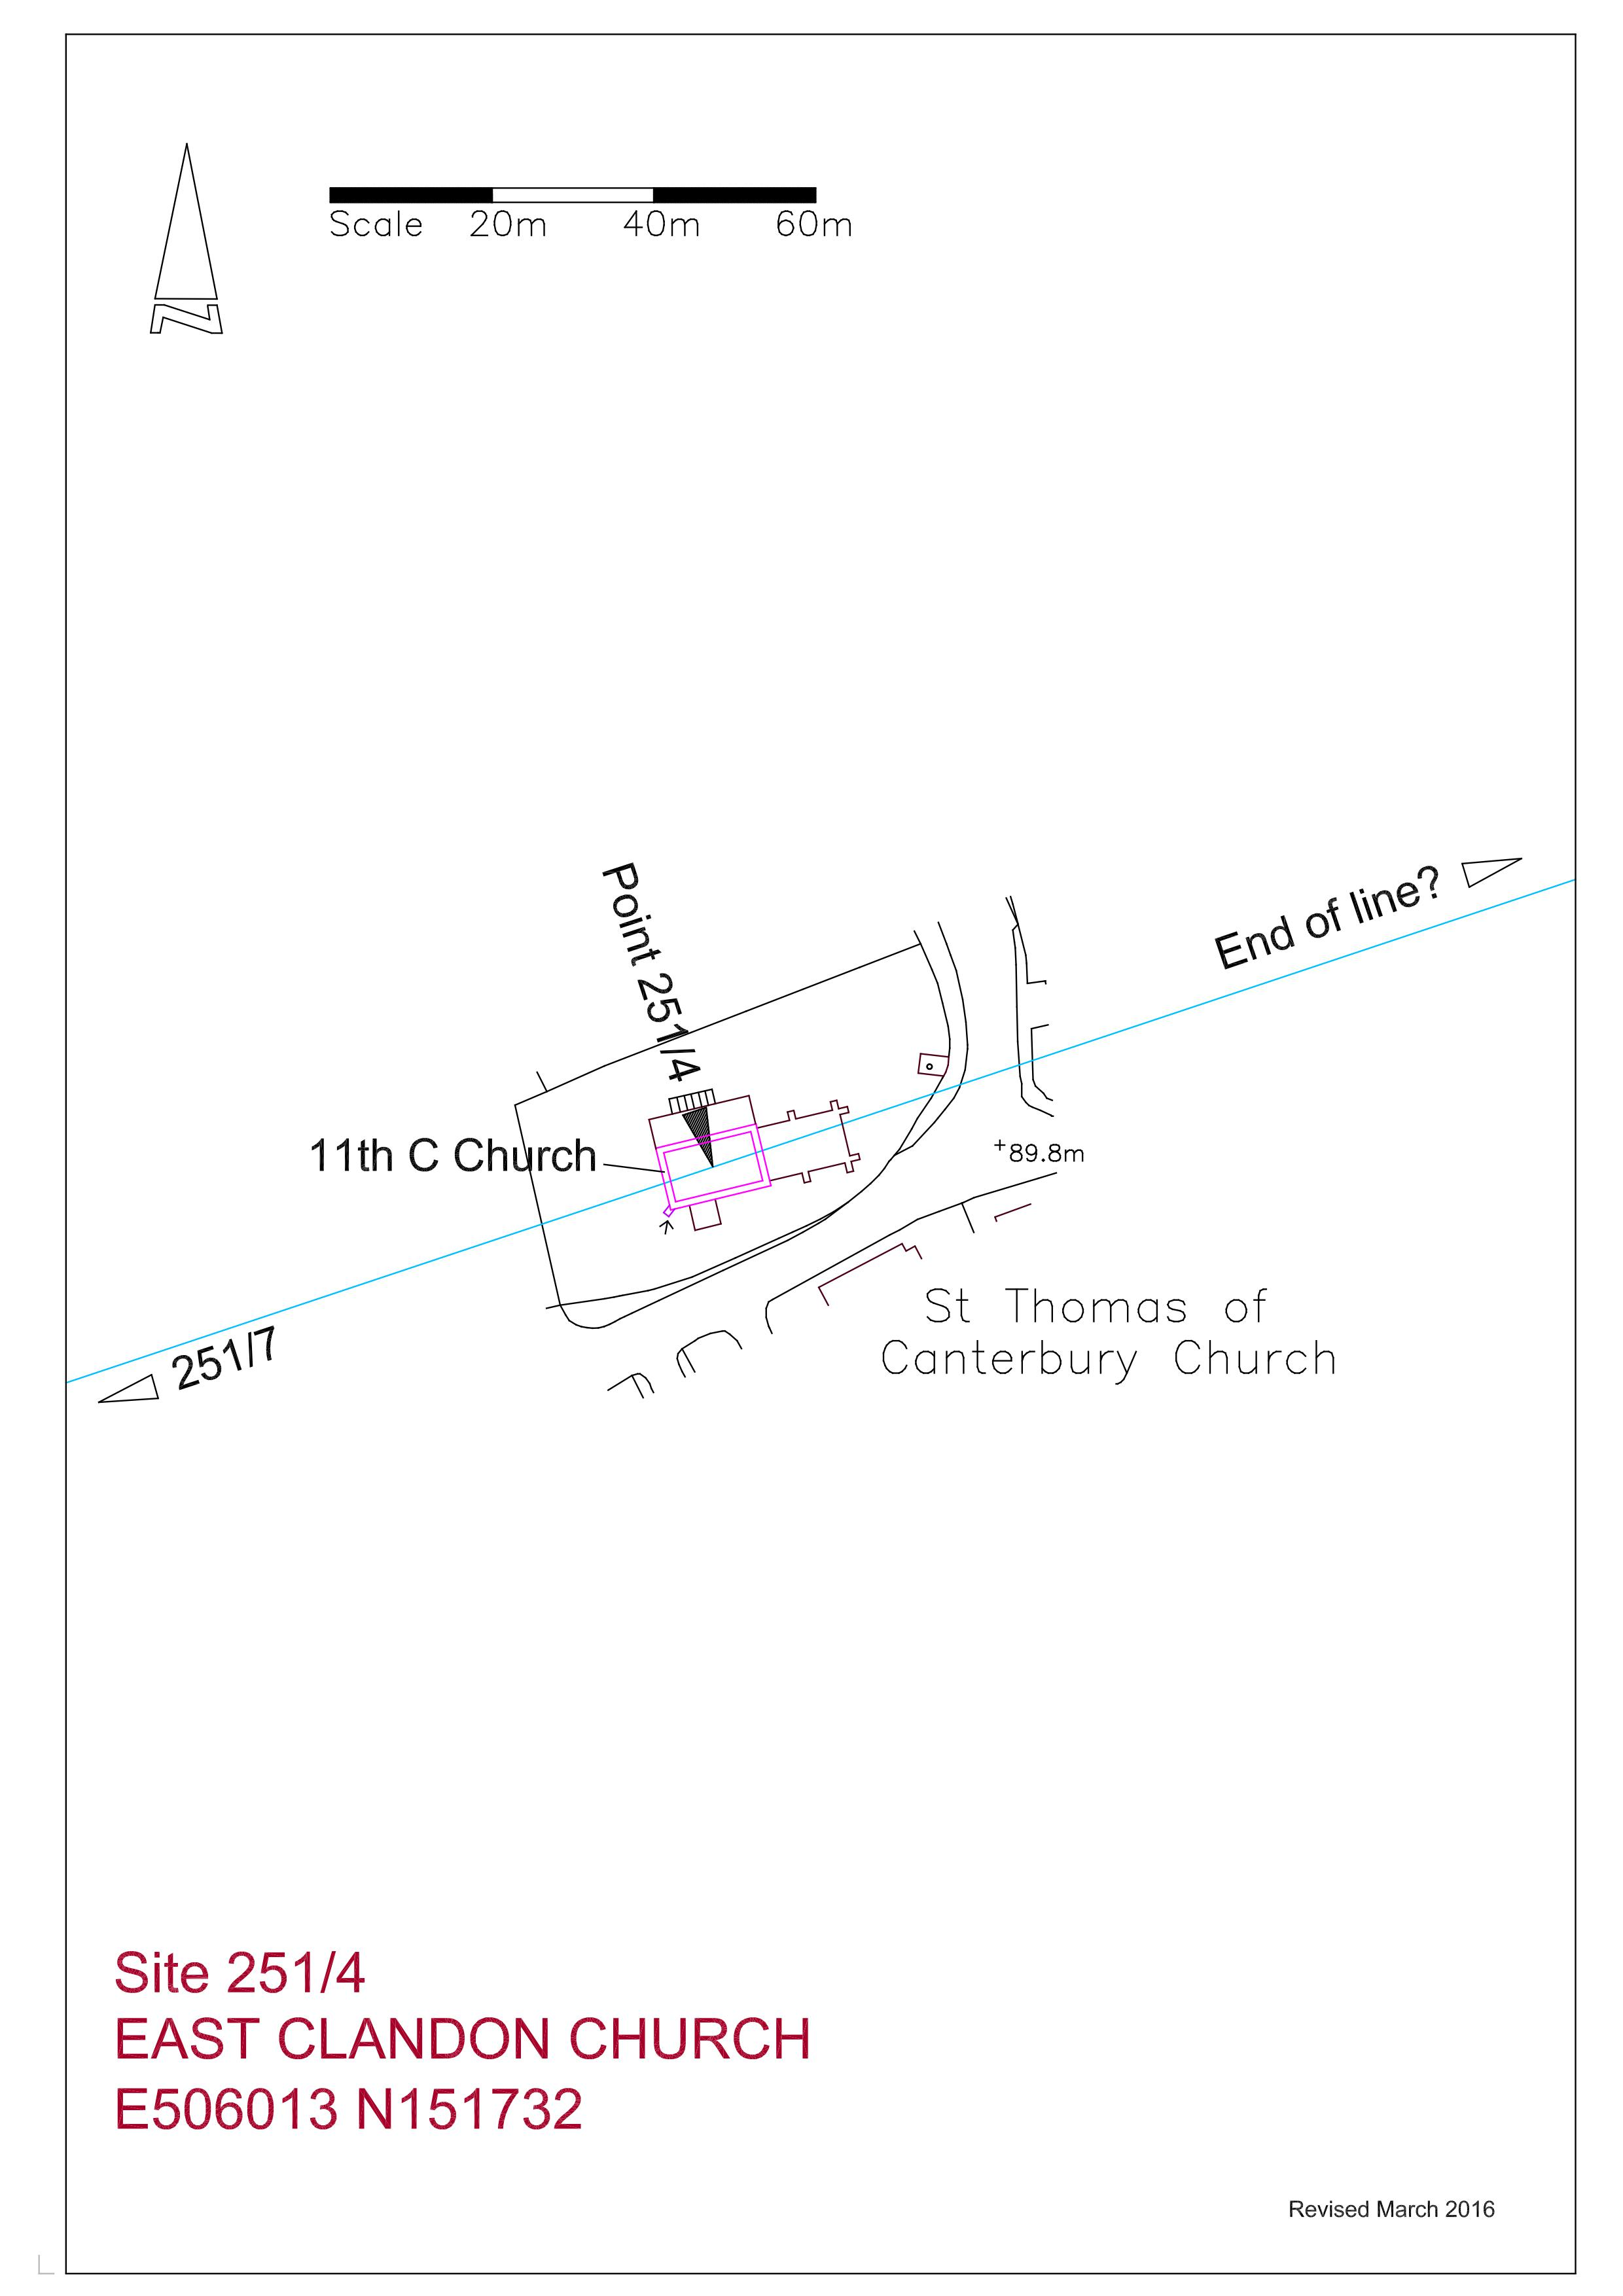 251_4 East Clandon Church